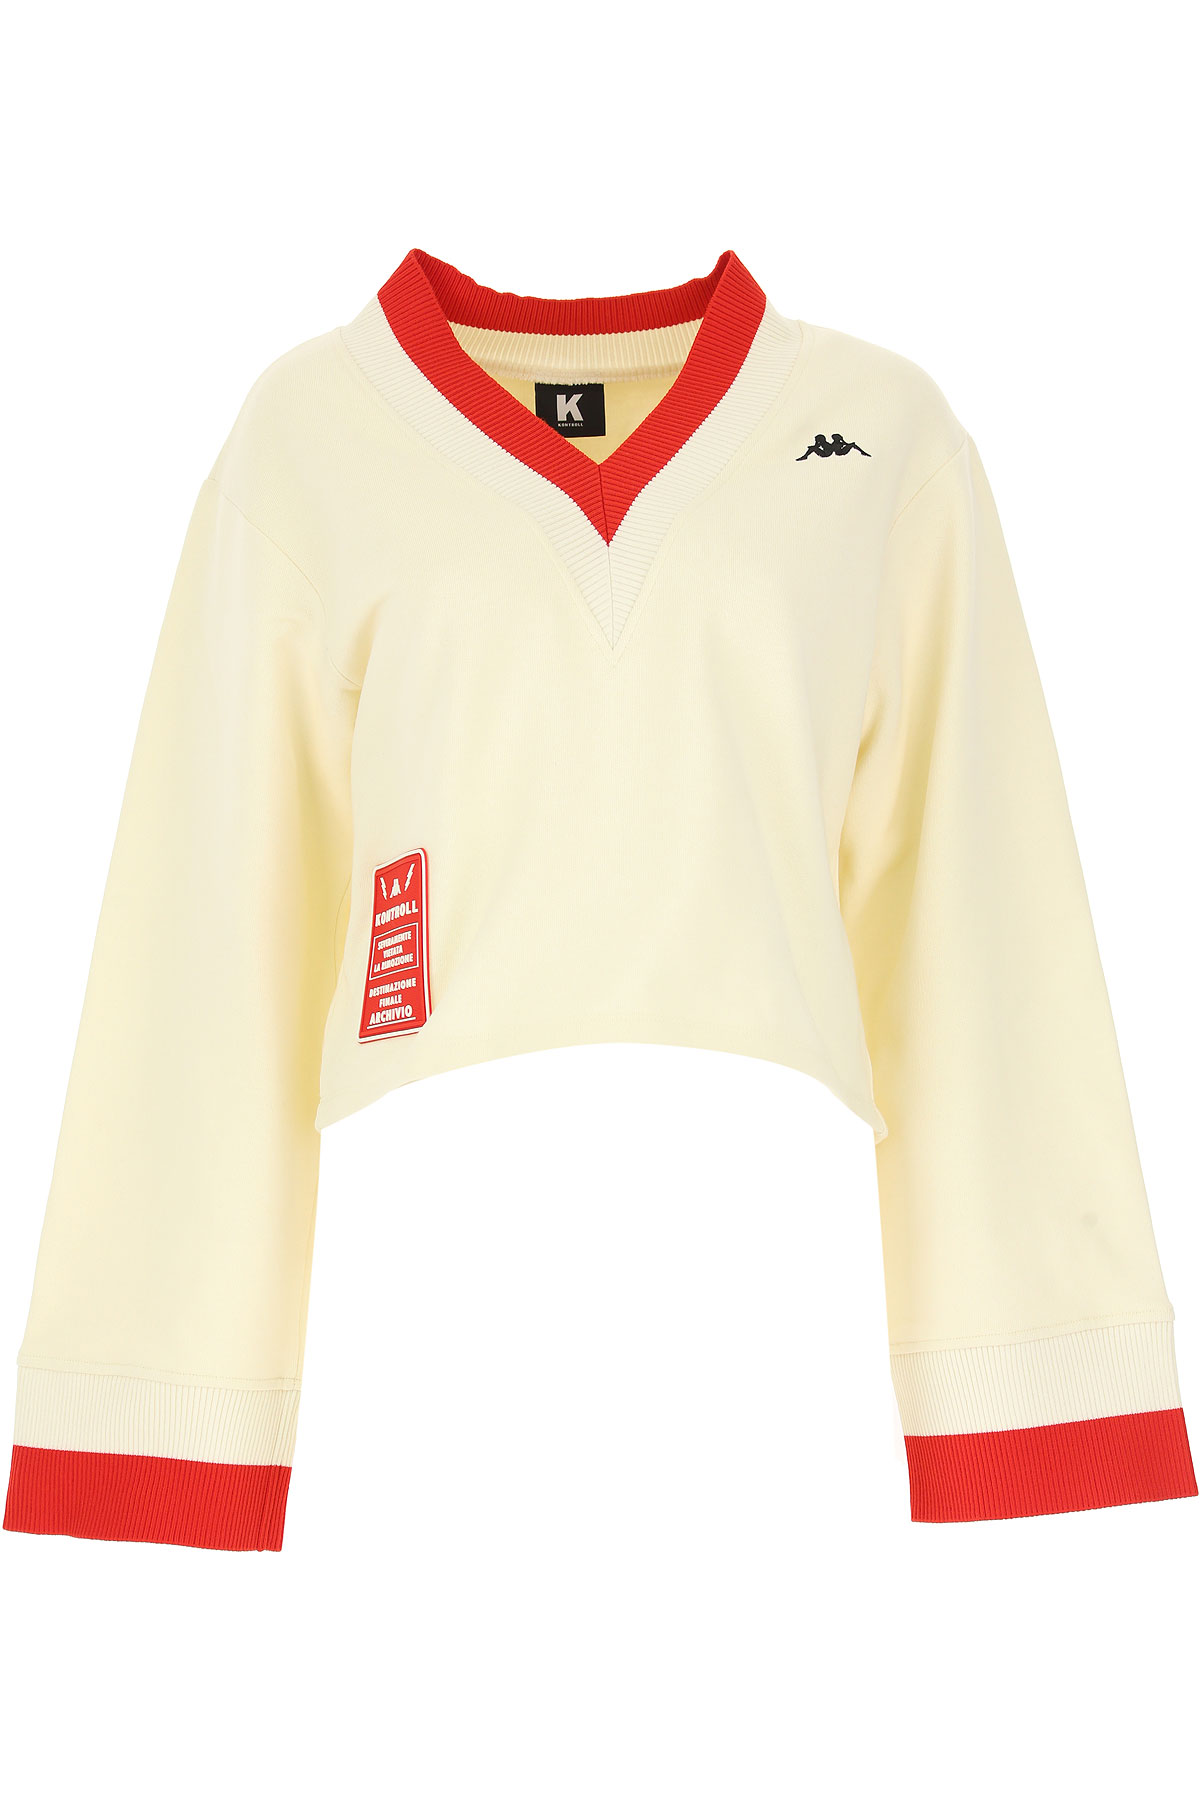 Image of Kappa Sweater for Women Jumper, Kappa Kontroll, Cream, Cotton, 2017, 10 4 6 8